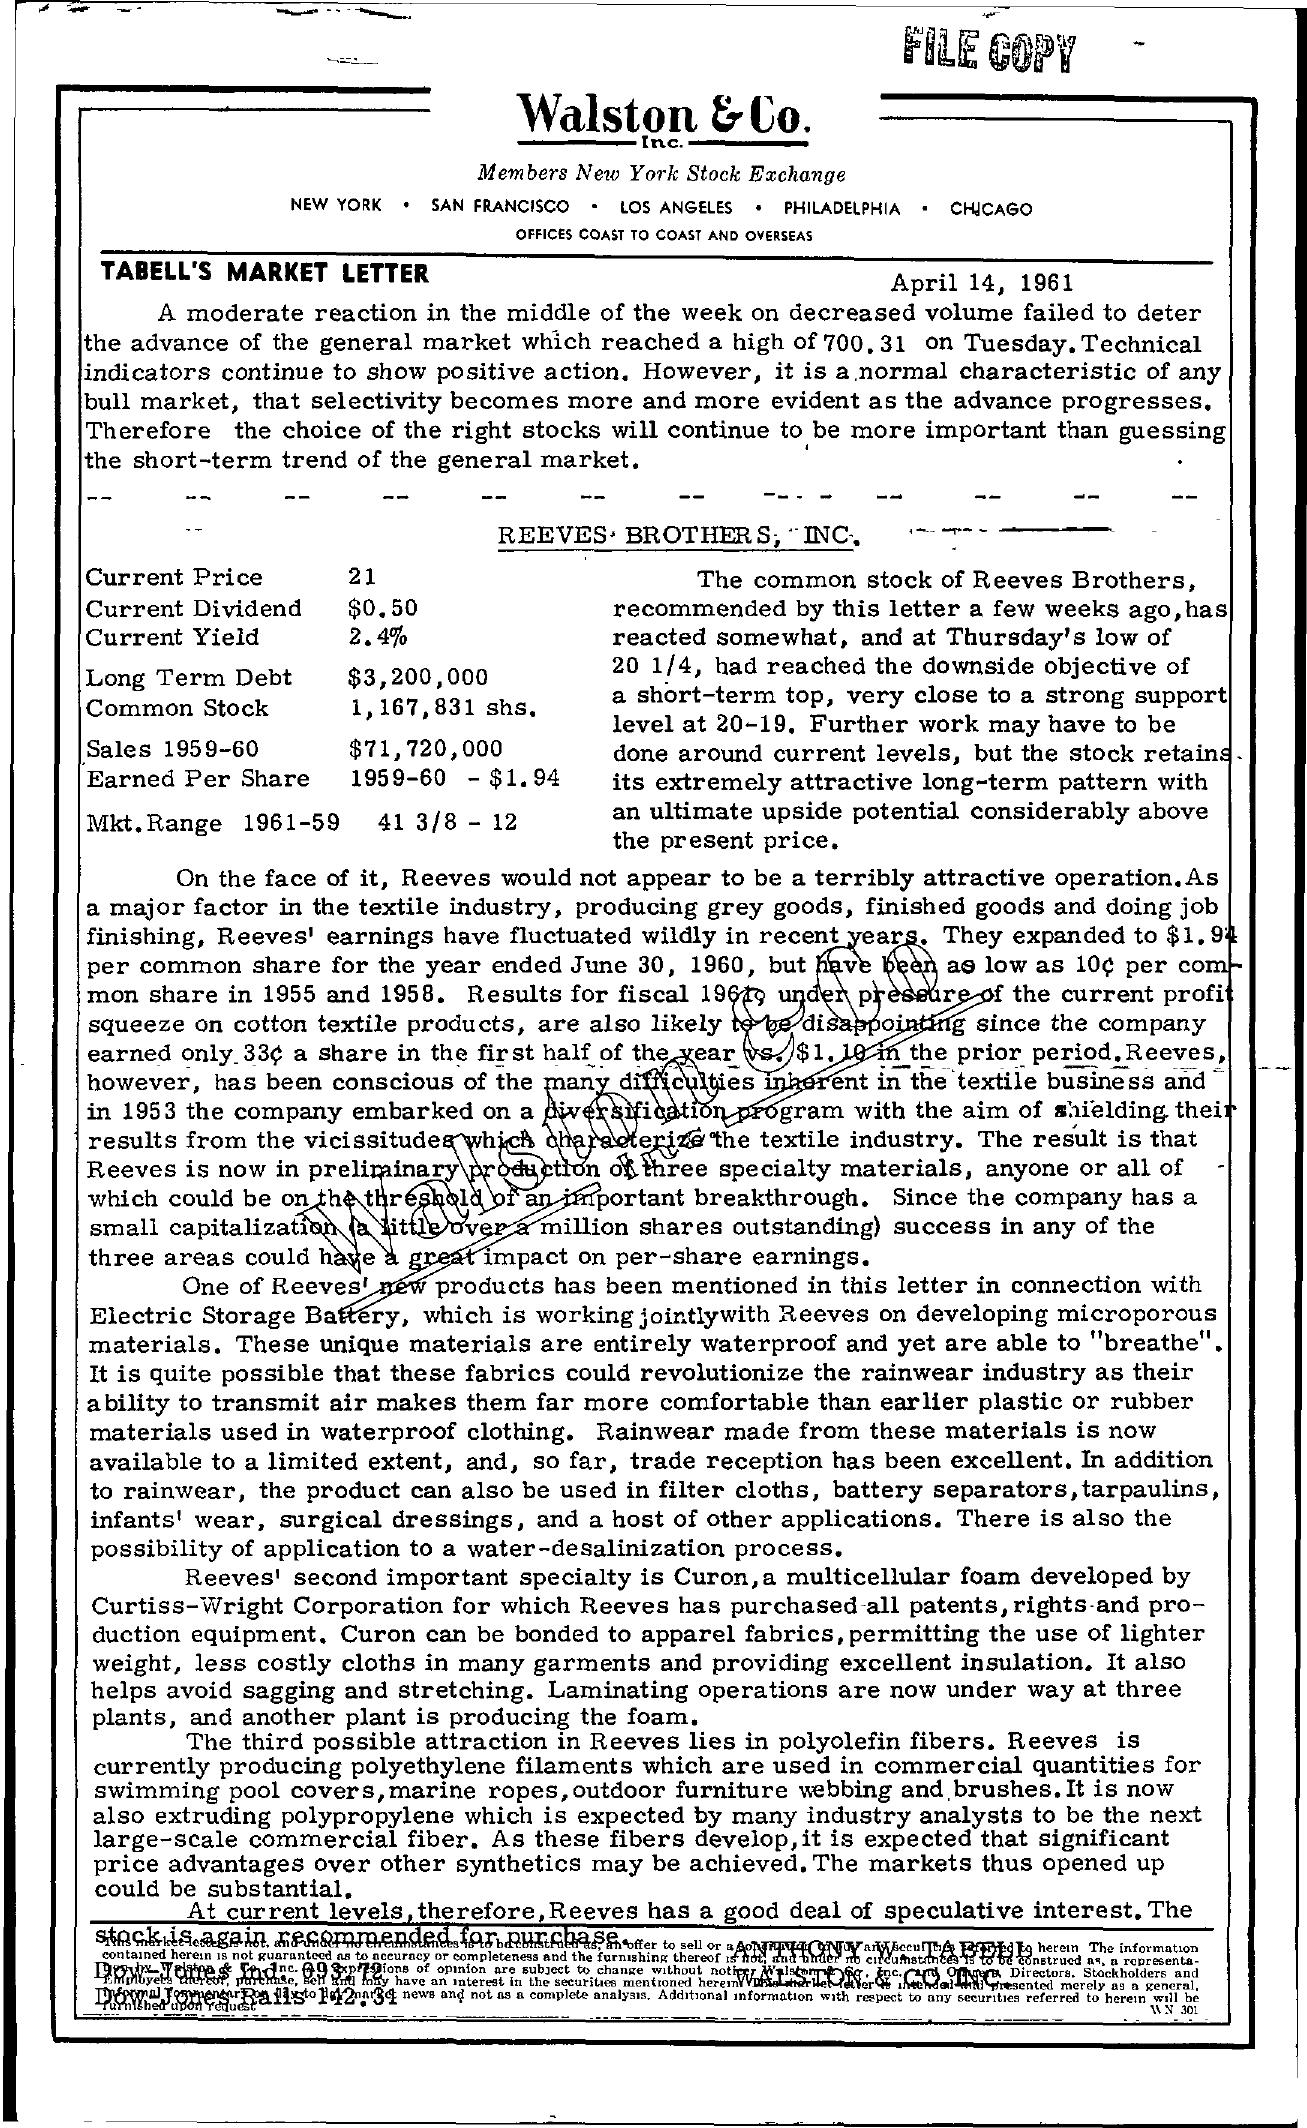 Tabell's Market Letter - April 14, 1961